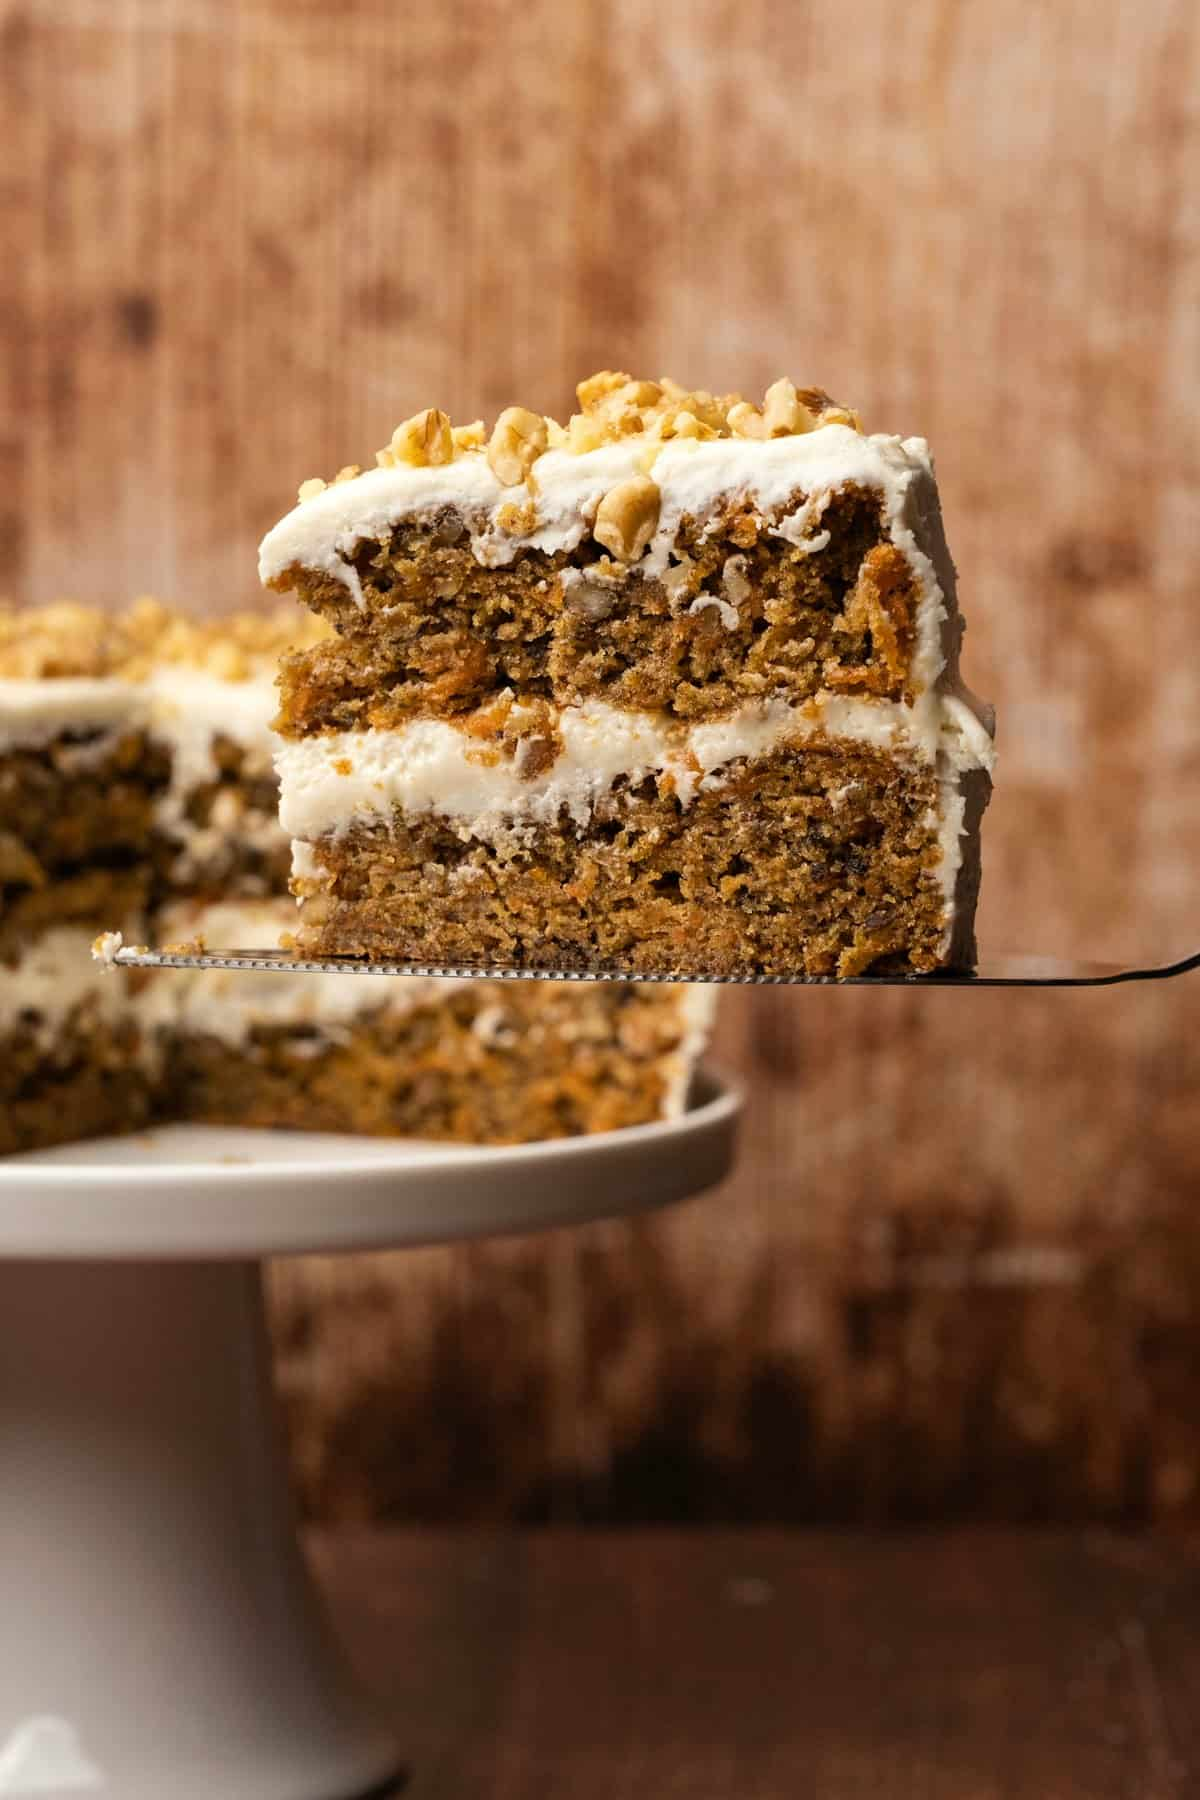 Slice of vegan carrot cake on a cake lifter.